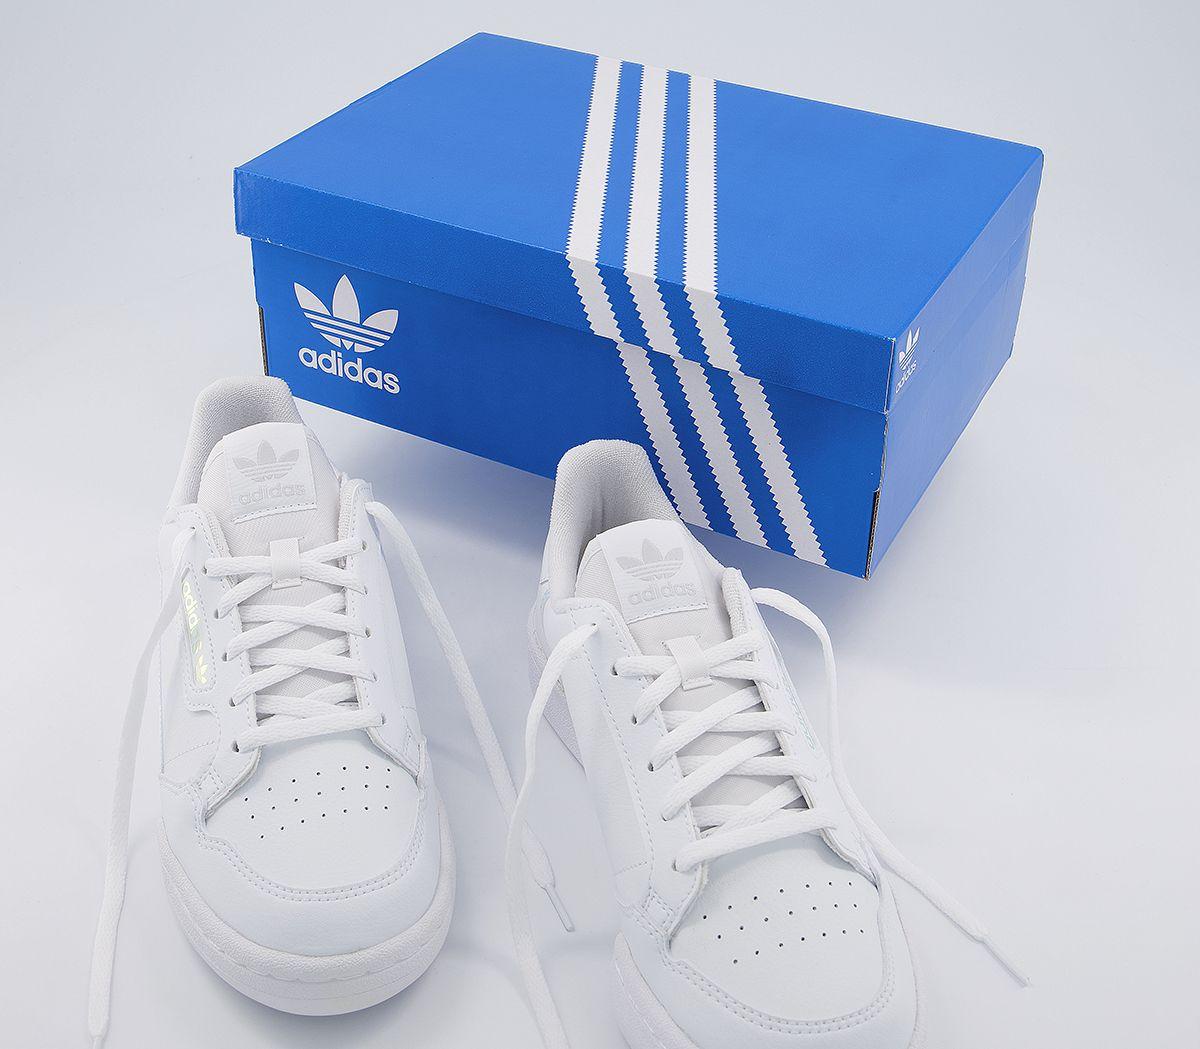 Bambini-Adidas-Continental-anni-039-80-JNR-Scarpe-da-ginnastica-bianco-iridescente-Kids miniatura 16